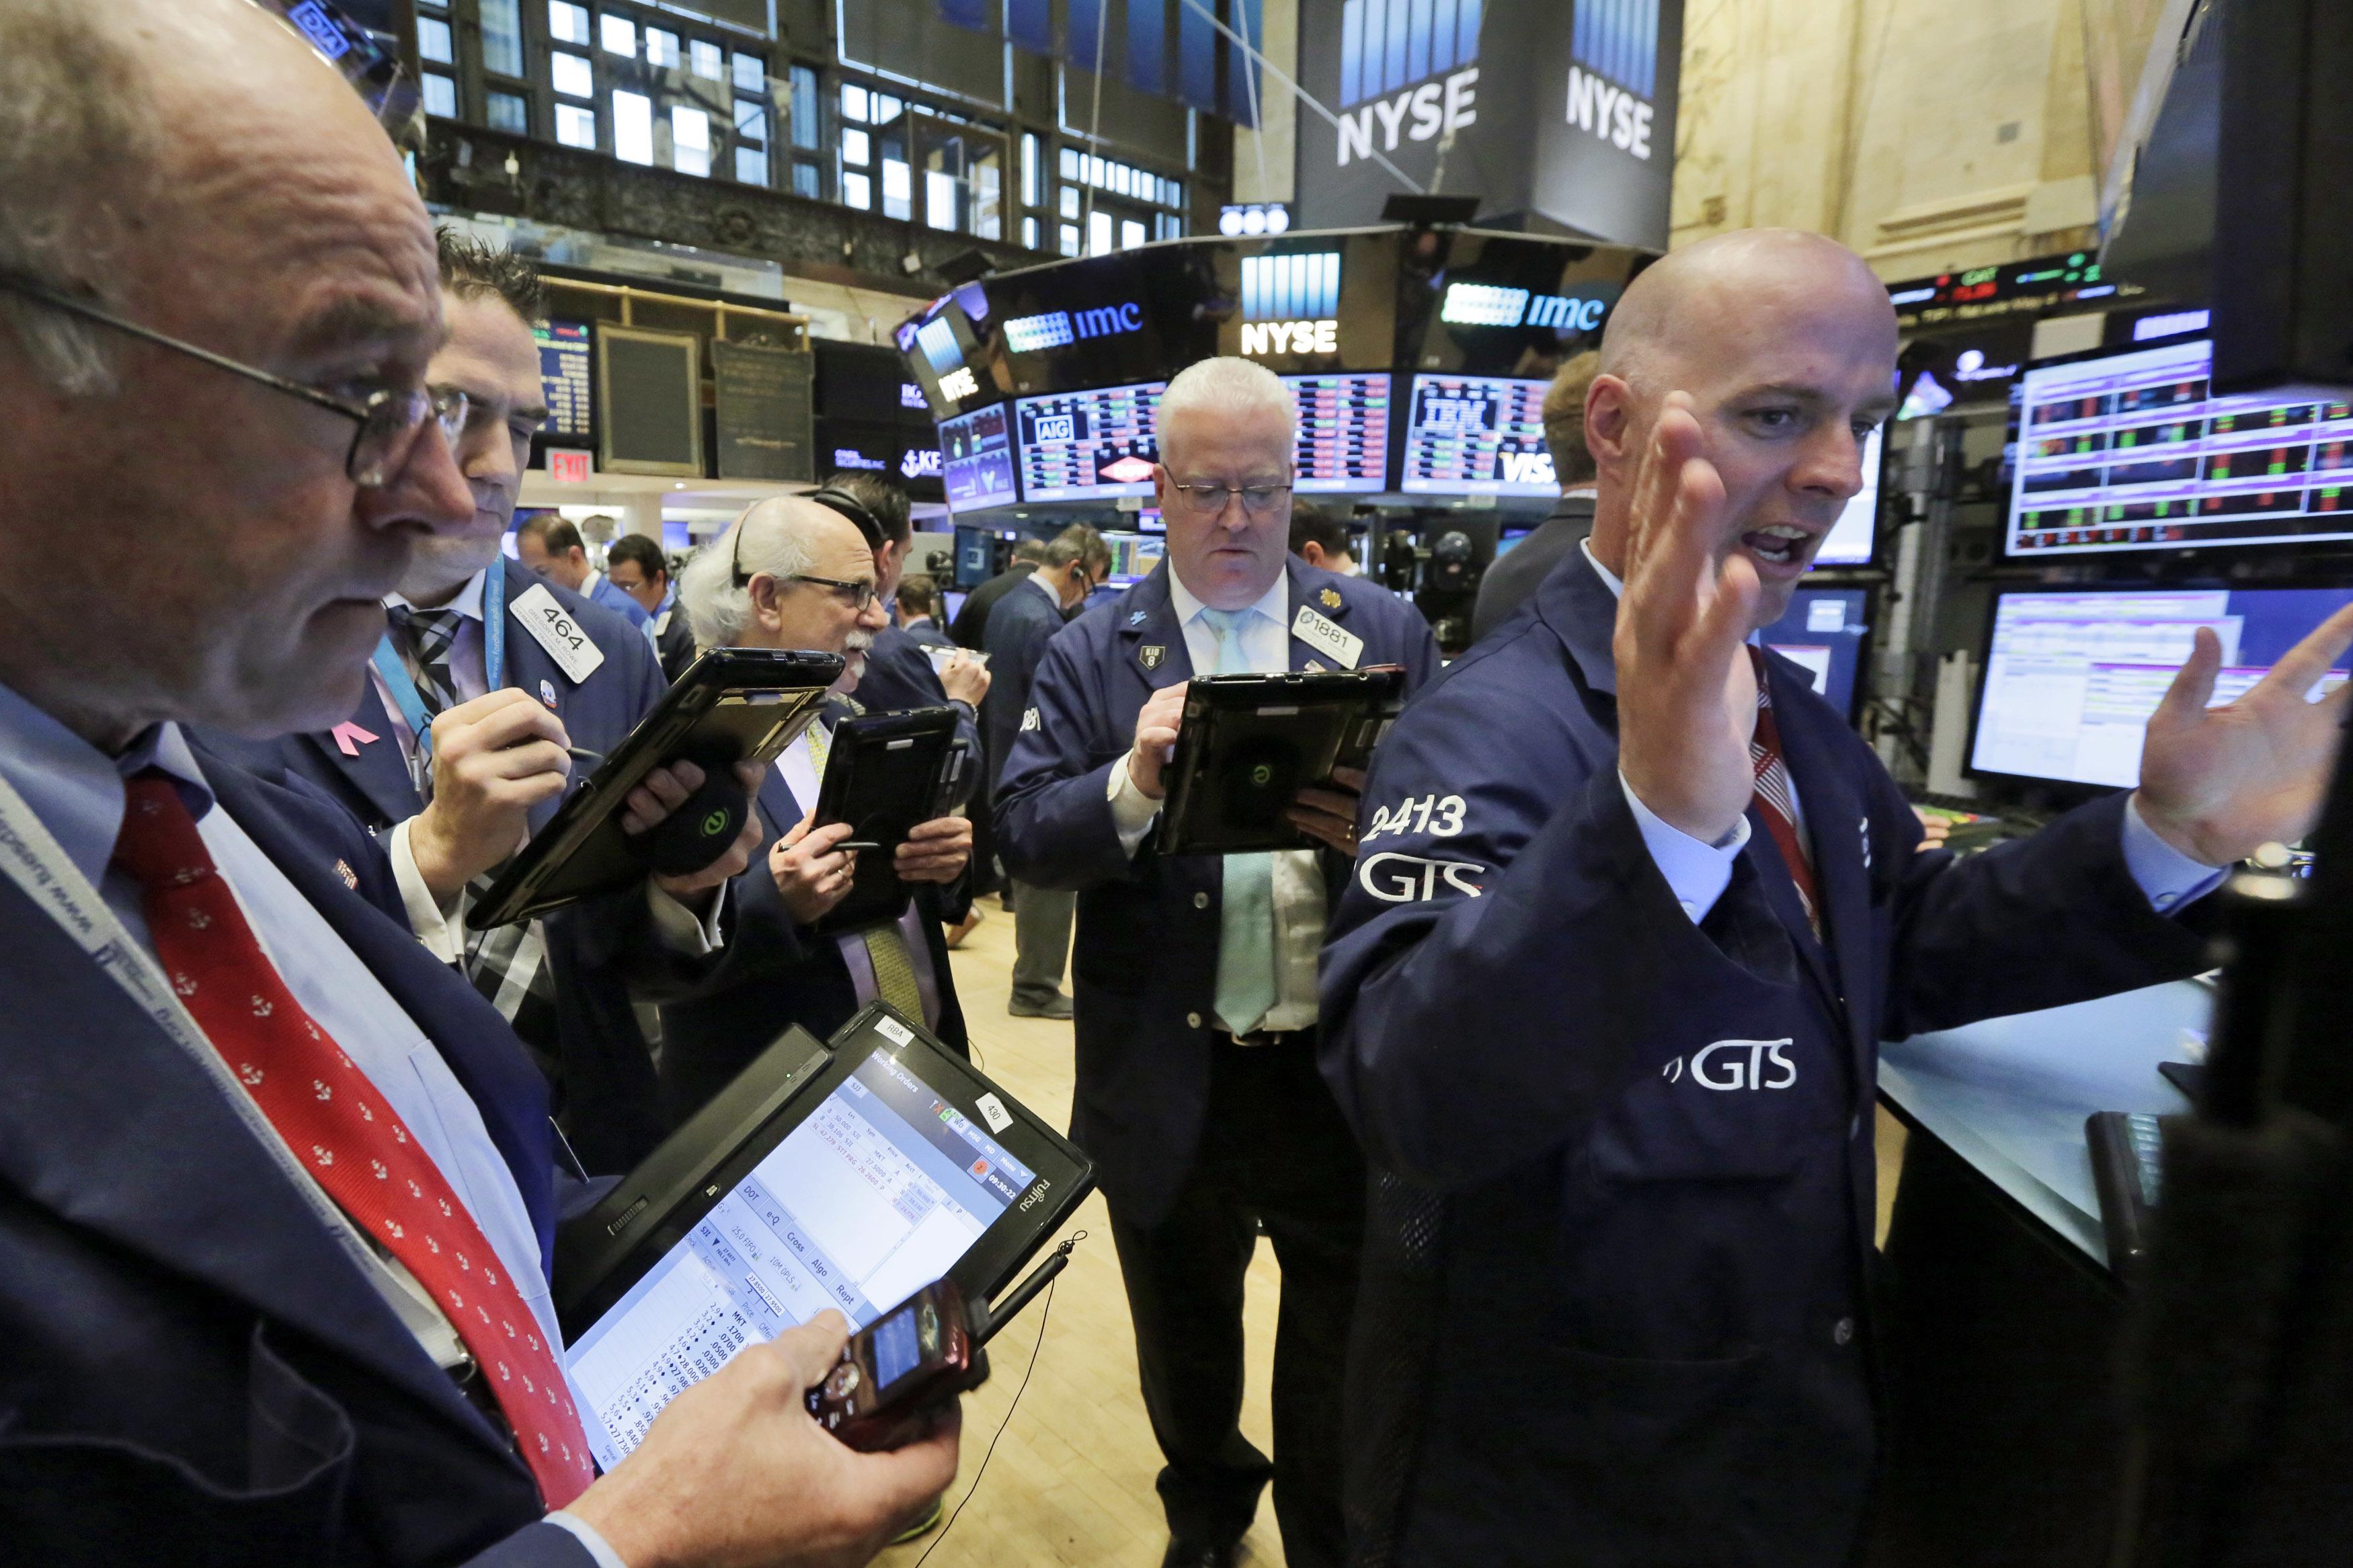 PA ANALYSIS: Buffett's bite into Apple highlights